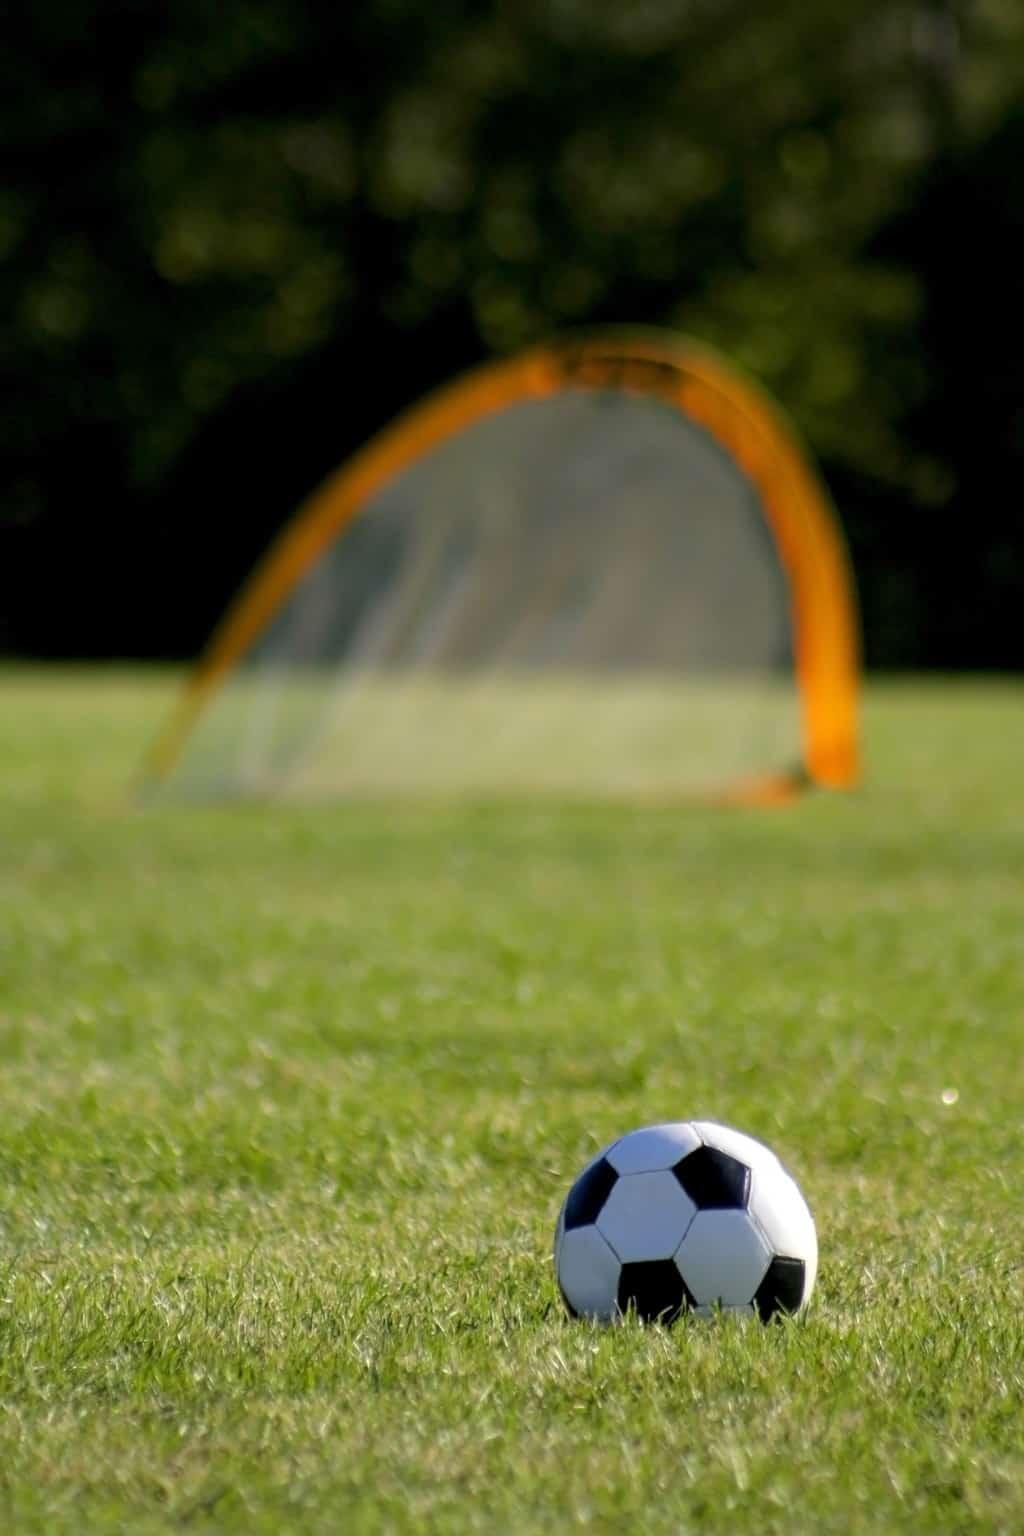 soccer ball in front of a soccer rebounder